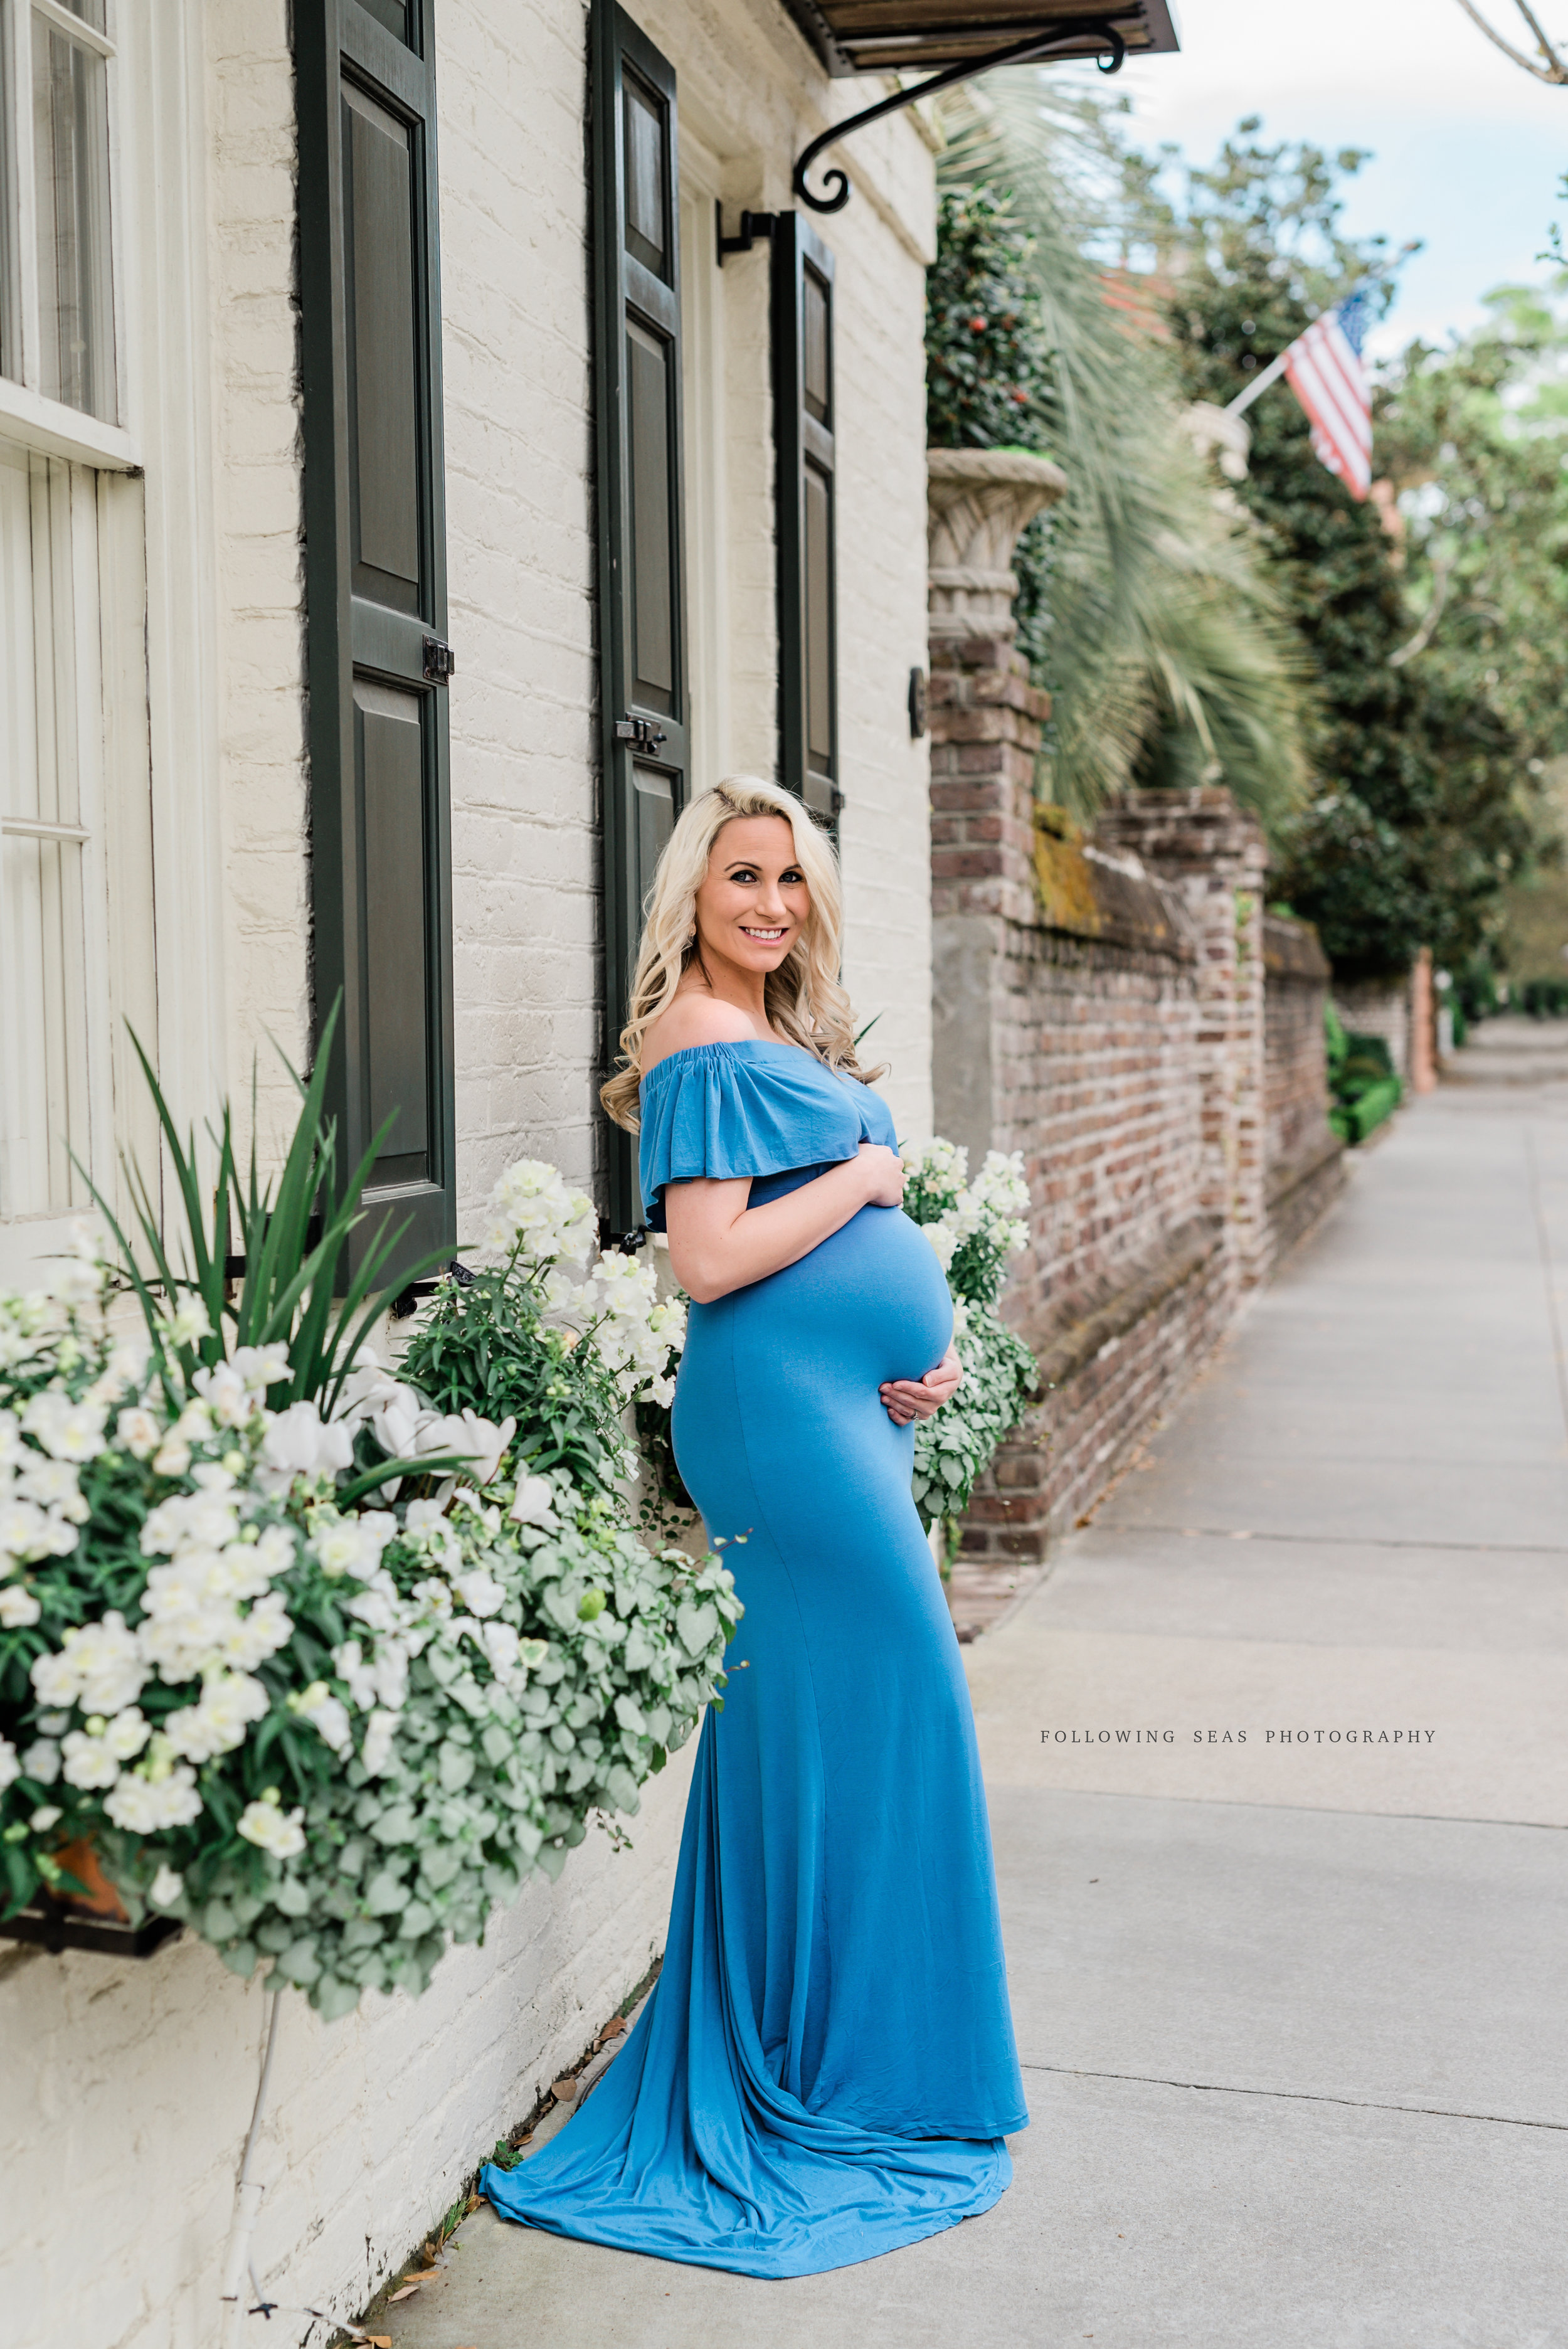 Charleston-Maternity-Photographer-Following-Seas-Photography-FSP_0110.jpg